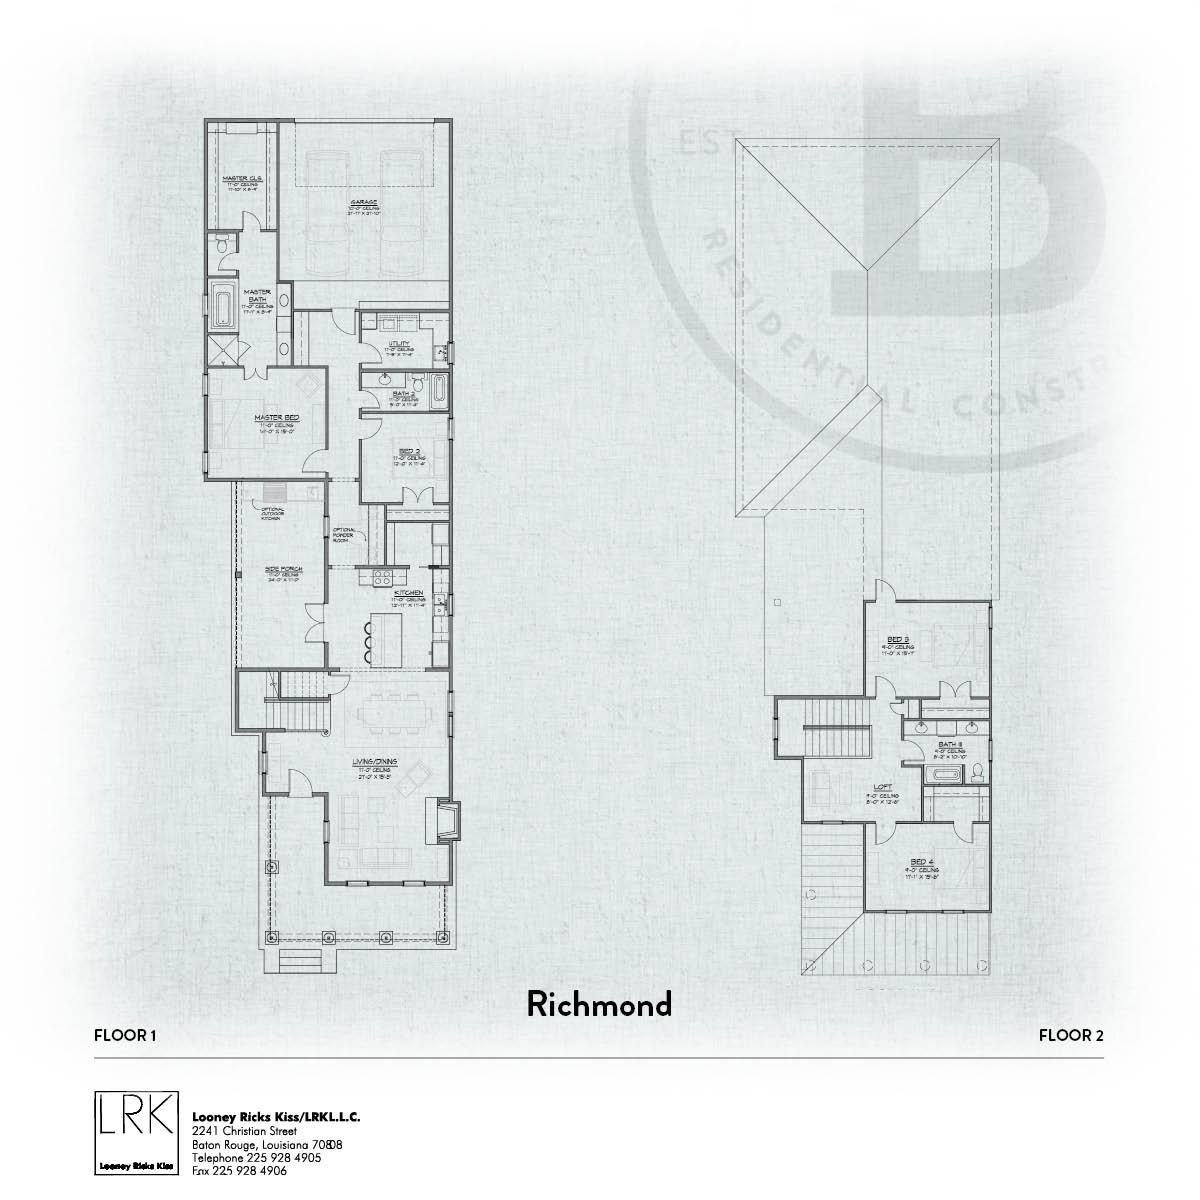 Richmond Floorplan